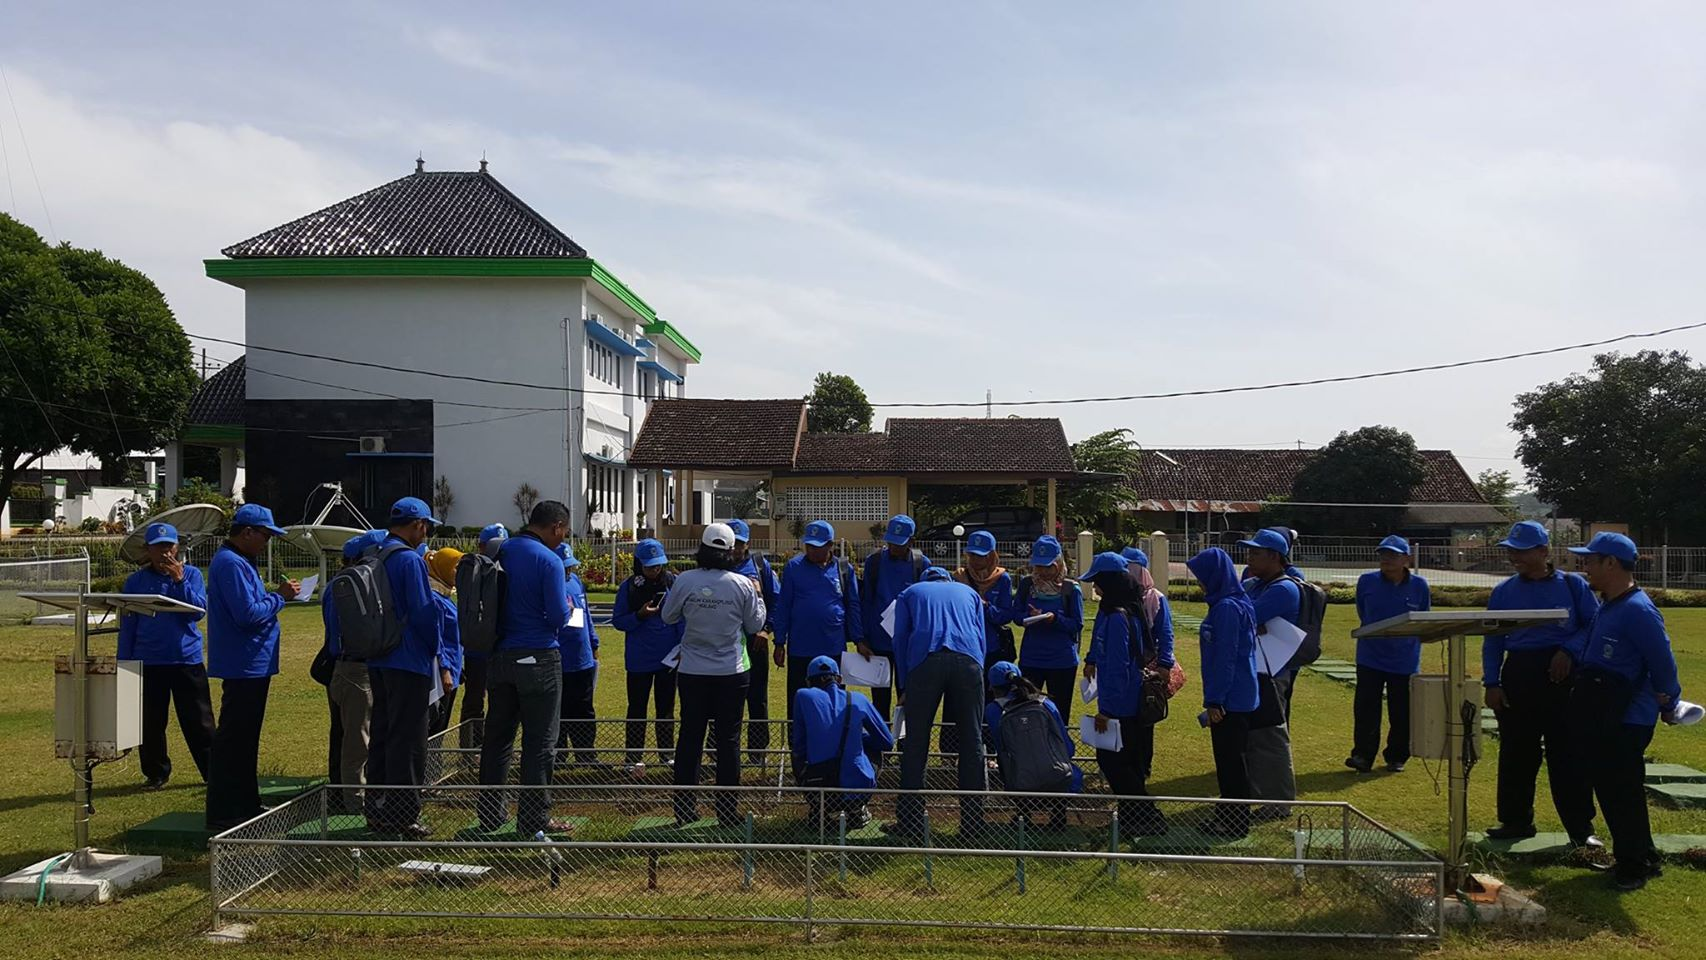 Kamis, 9-3-2017 Kunjungan Peserta Bimbingan Teknis Peningkatan Mutu Tembakau Virginia Dinas Perkebunan Provinsi Jawa Timur